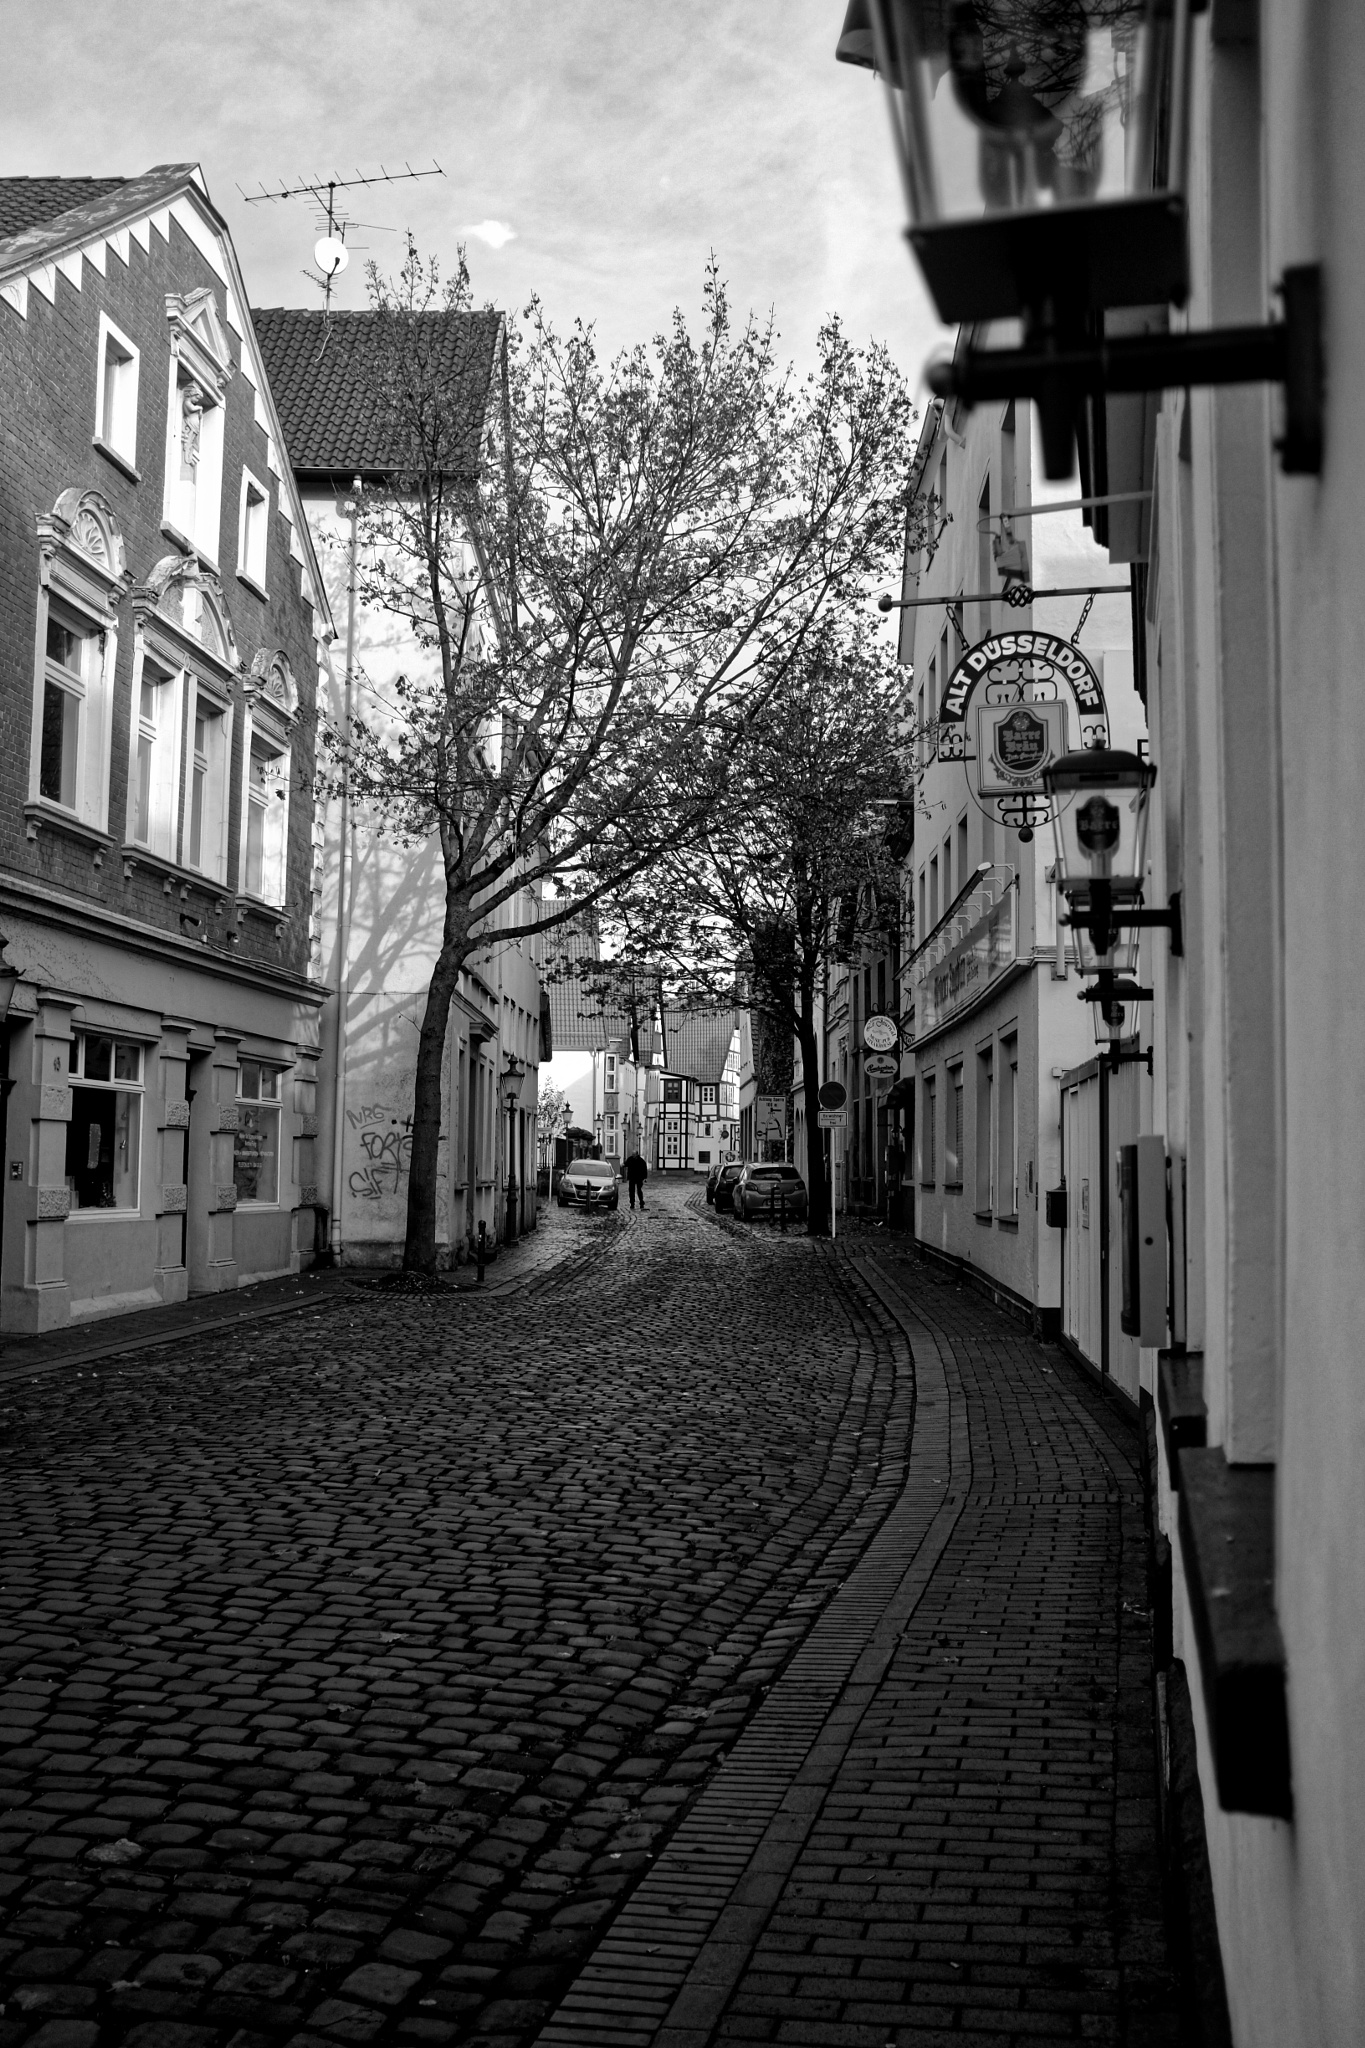 Ritterstrasse by peterkryzun